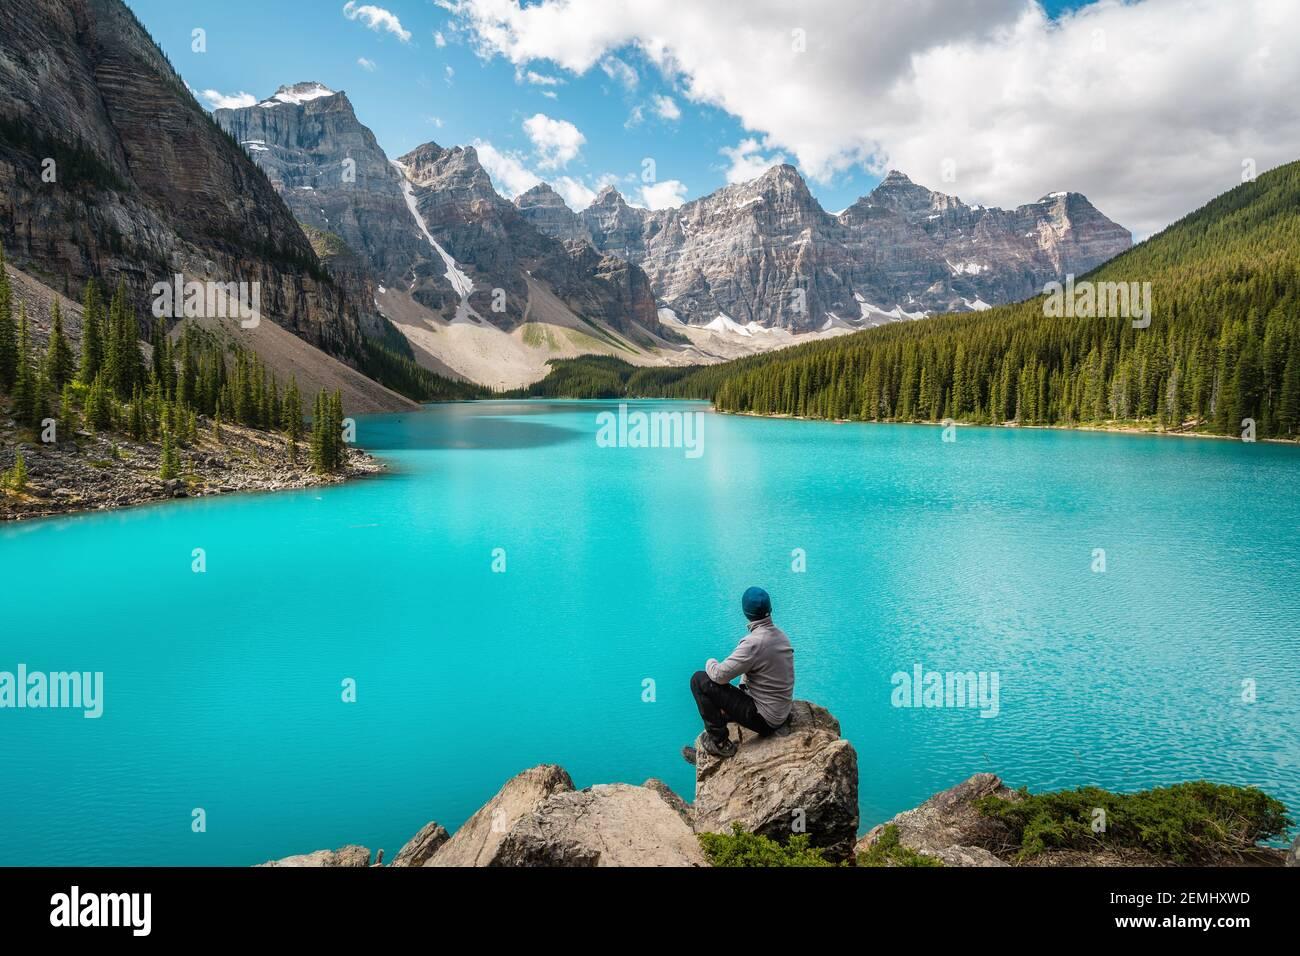 Hiker at Moraine Lake during summer in Banff National Park, Alberta, Canada. Stock Photo